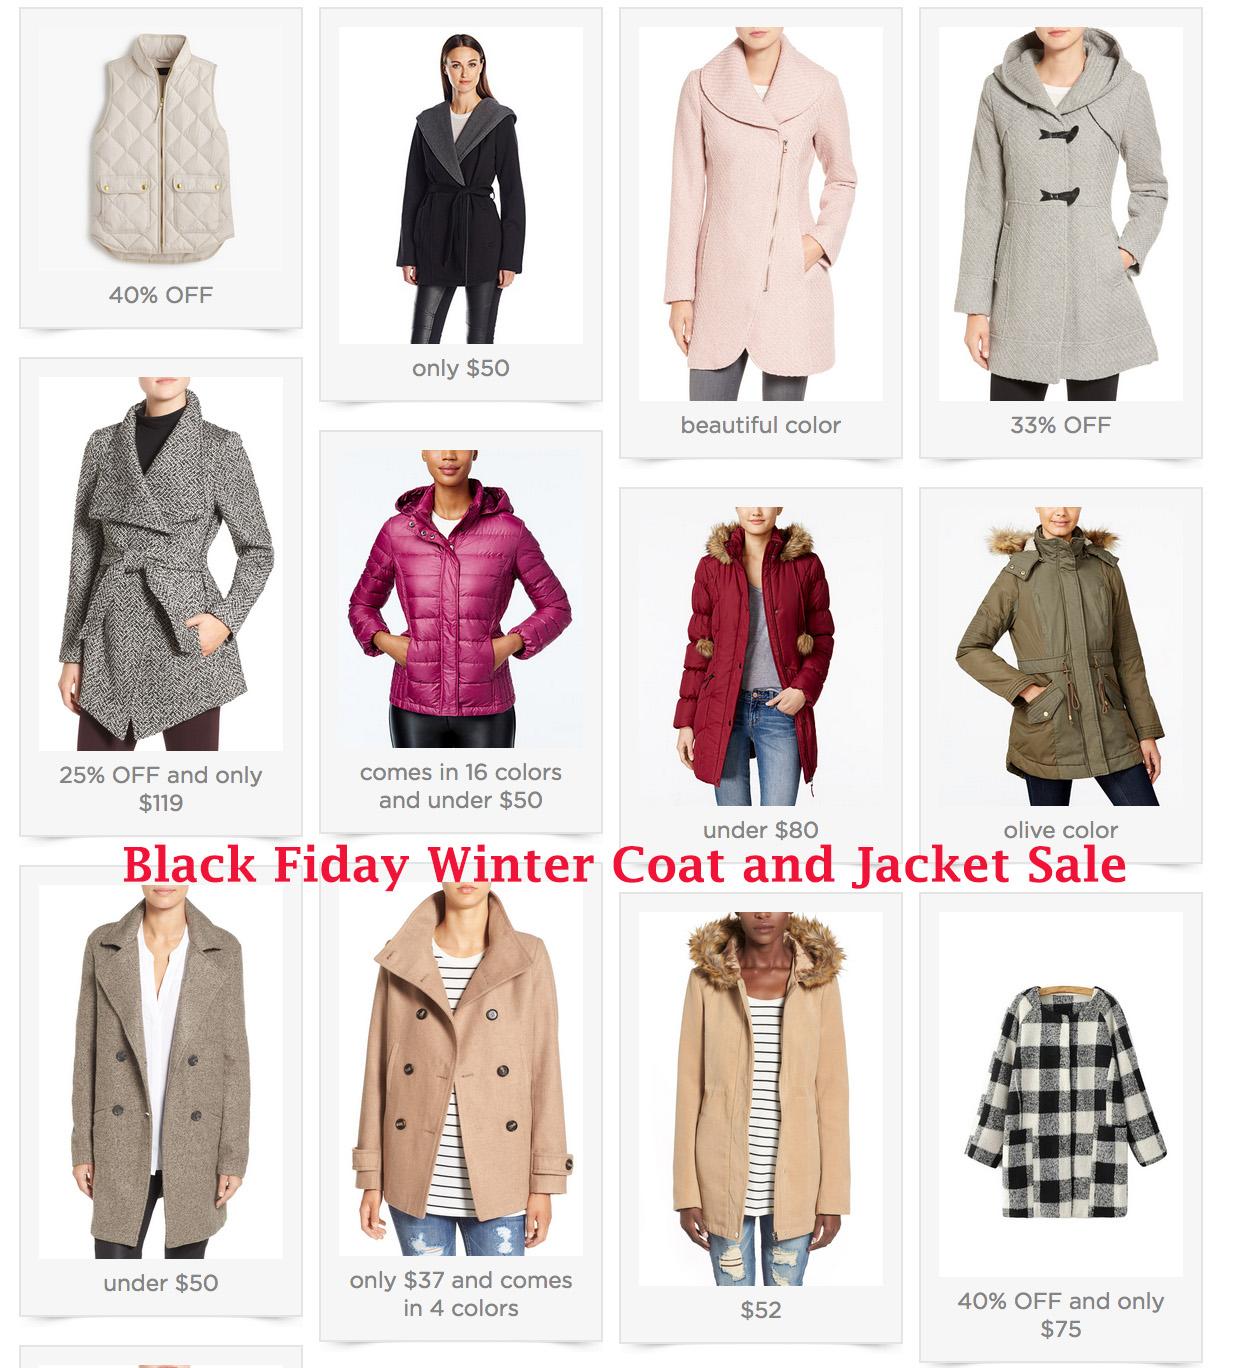 Black Friday Sales – Coats & Jackets